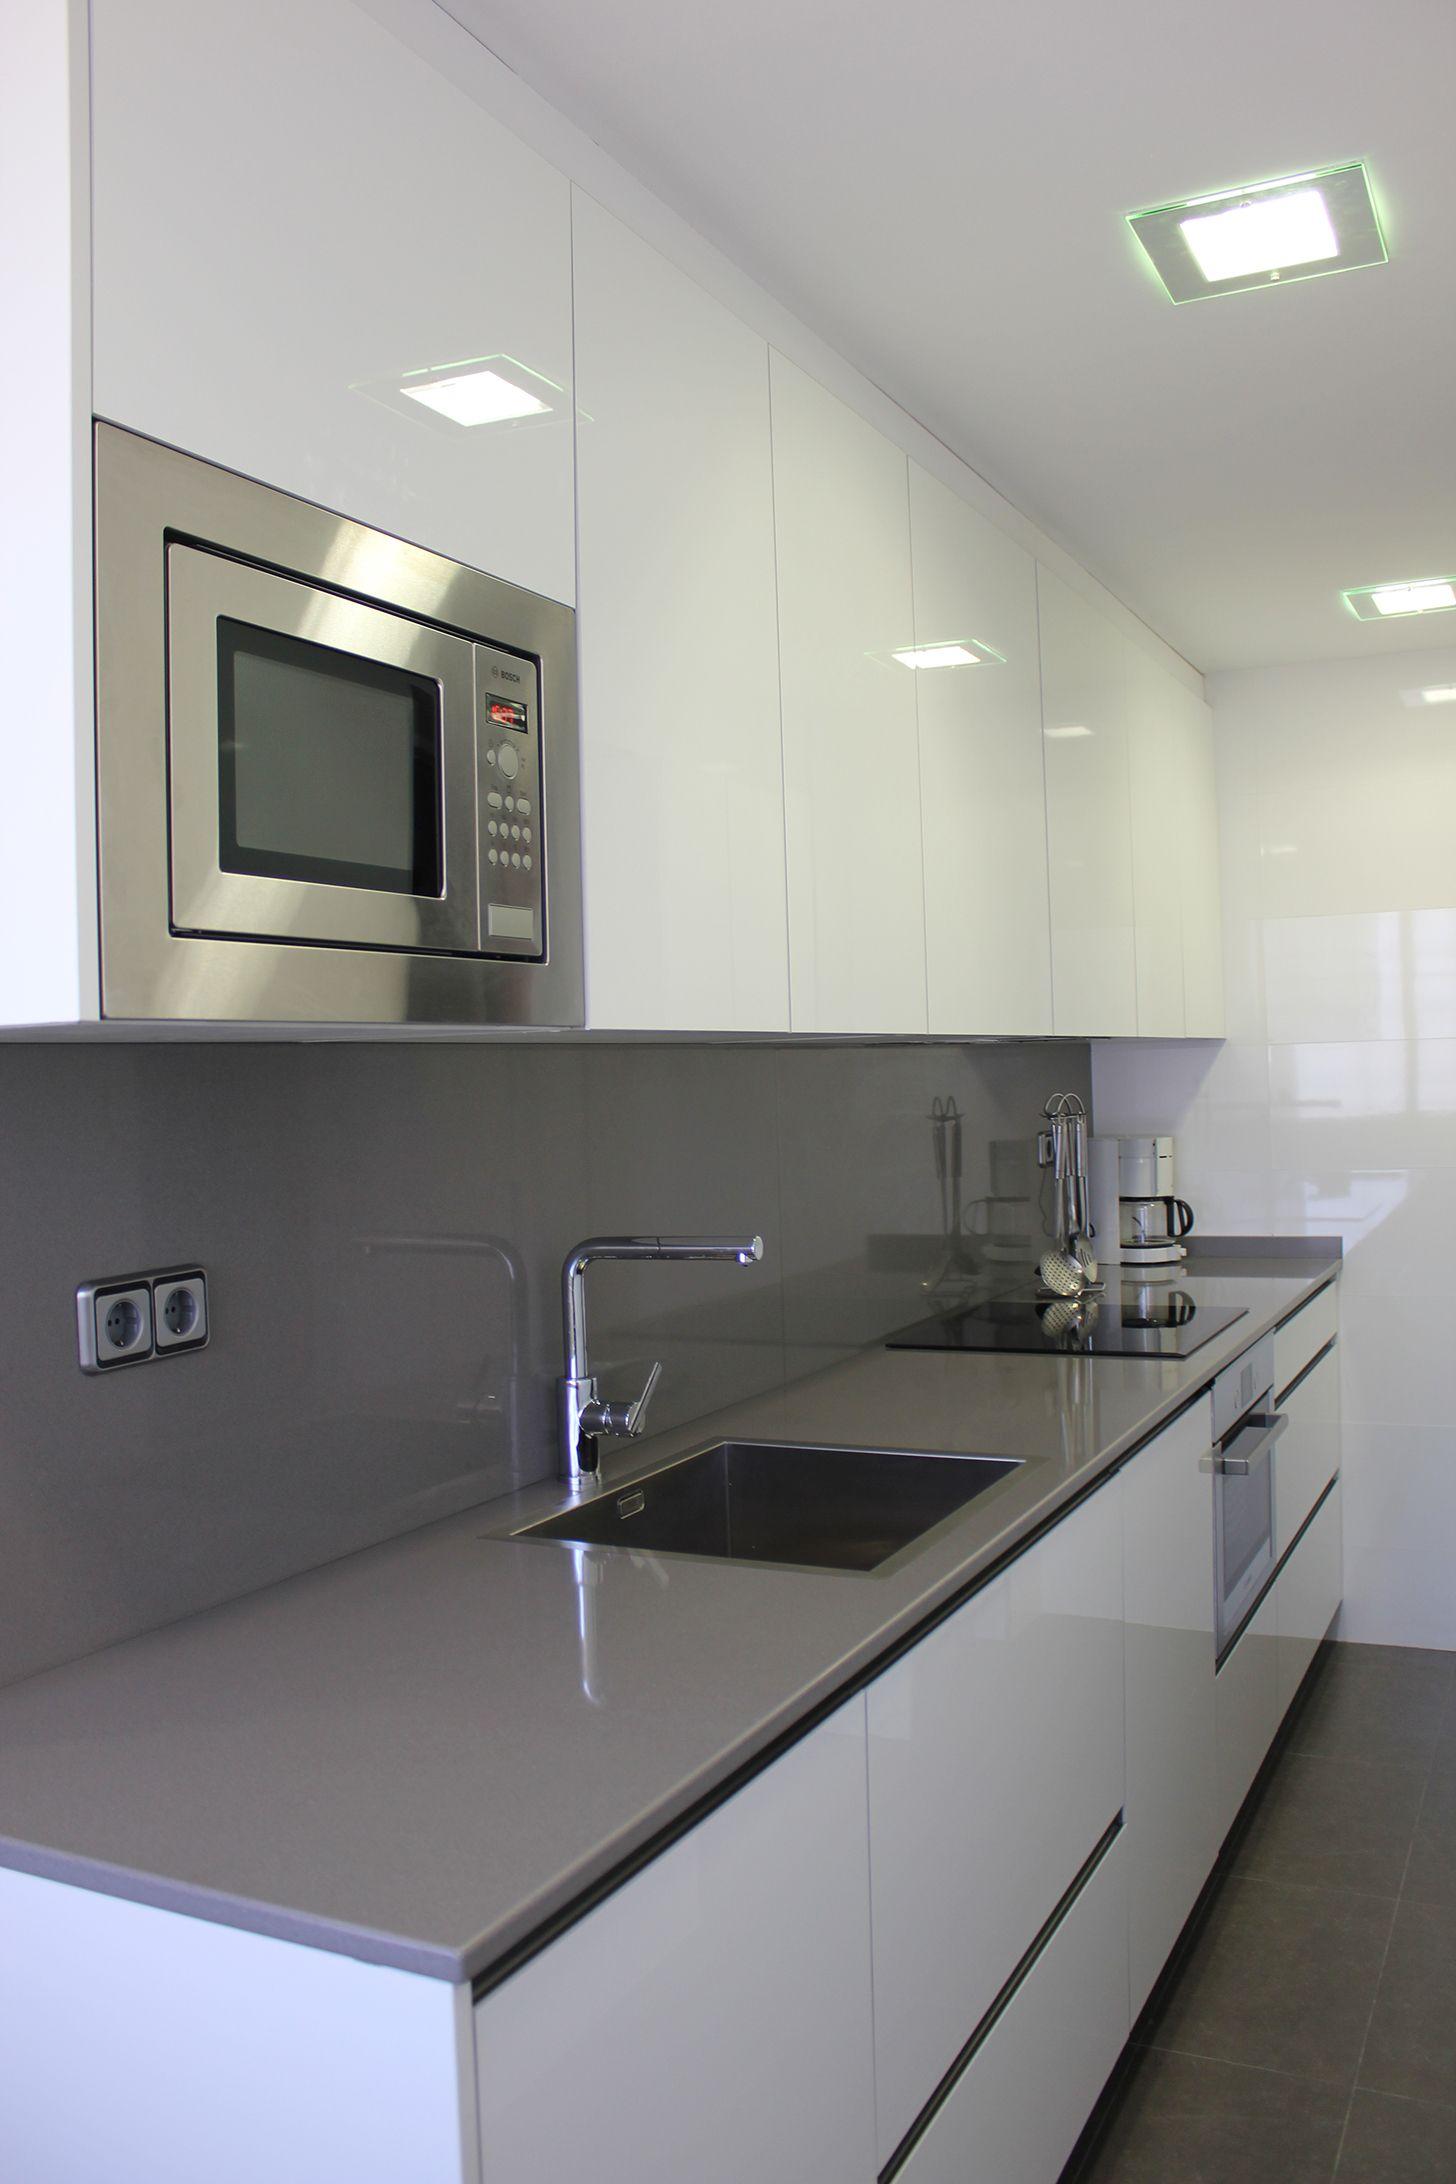 Lapitec Arbeitsplatte Und Ruckwand Sehr Edel Und Homogen Cocinas Modernas Cocinas Blancas Cocinas Pequenas